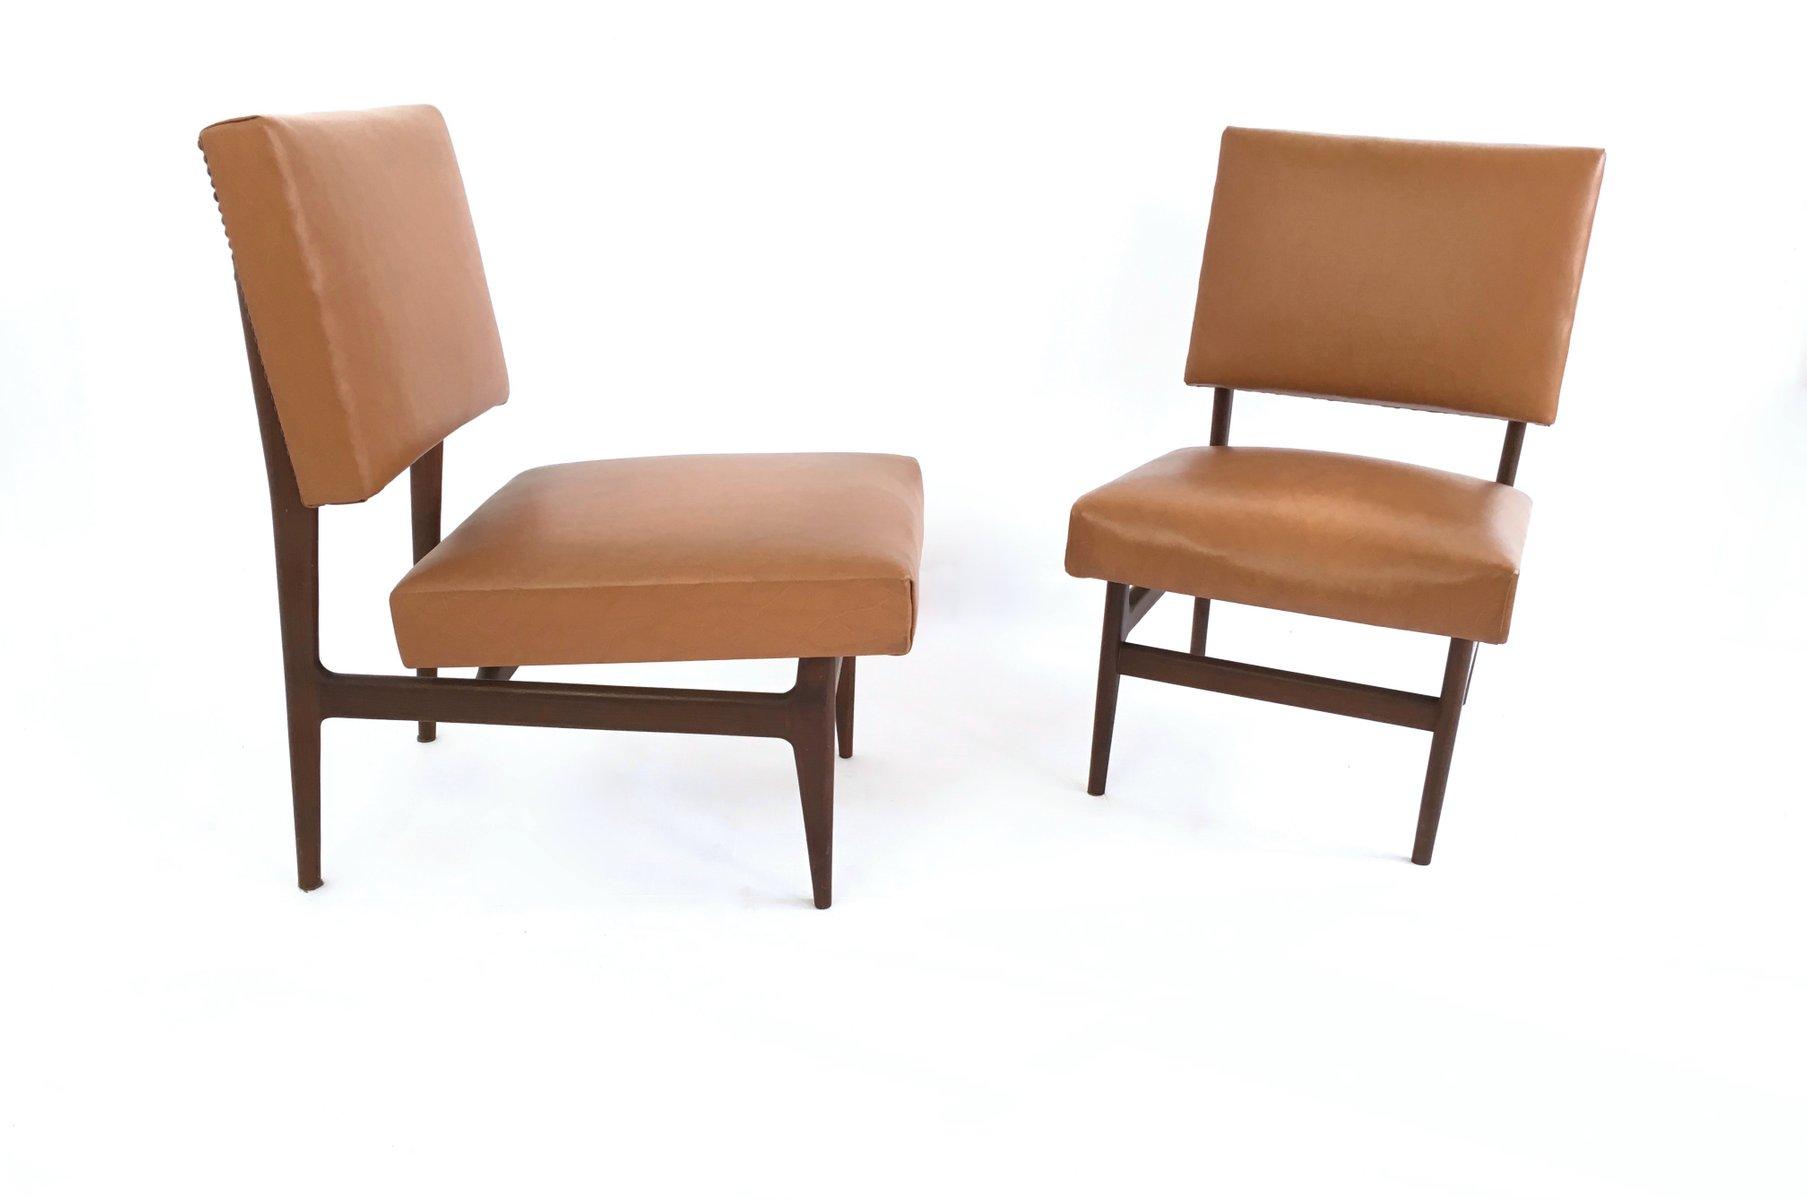 italienische mahagoni st hle mit skai leder 1950er 2er set bei pamono kaufen. Black Bedroom Furniture Sets. Home Design Ideas